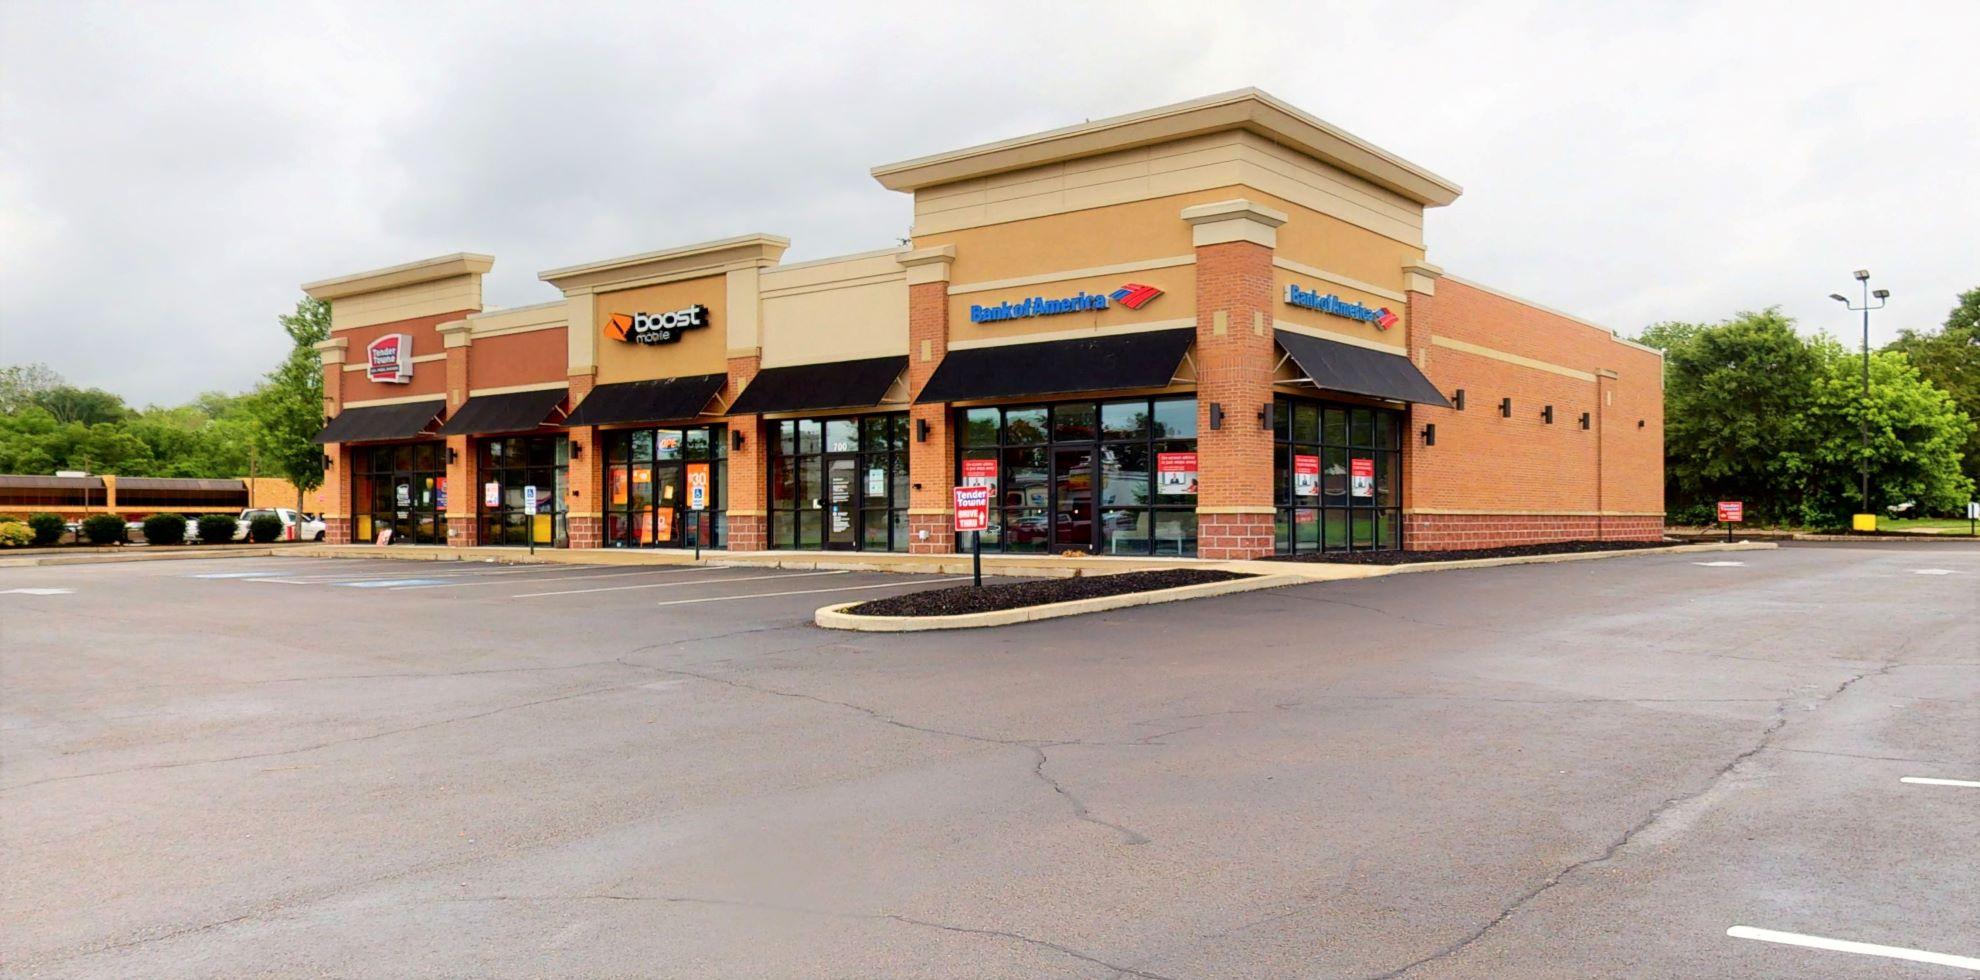 Bank of America Advanced Center with walk-up ATM   700 Loveland Madeira Rd Unit A3, Loveland, OH 45140